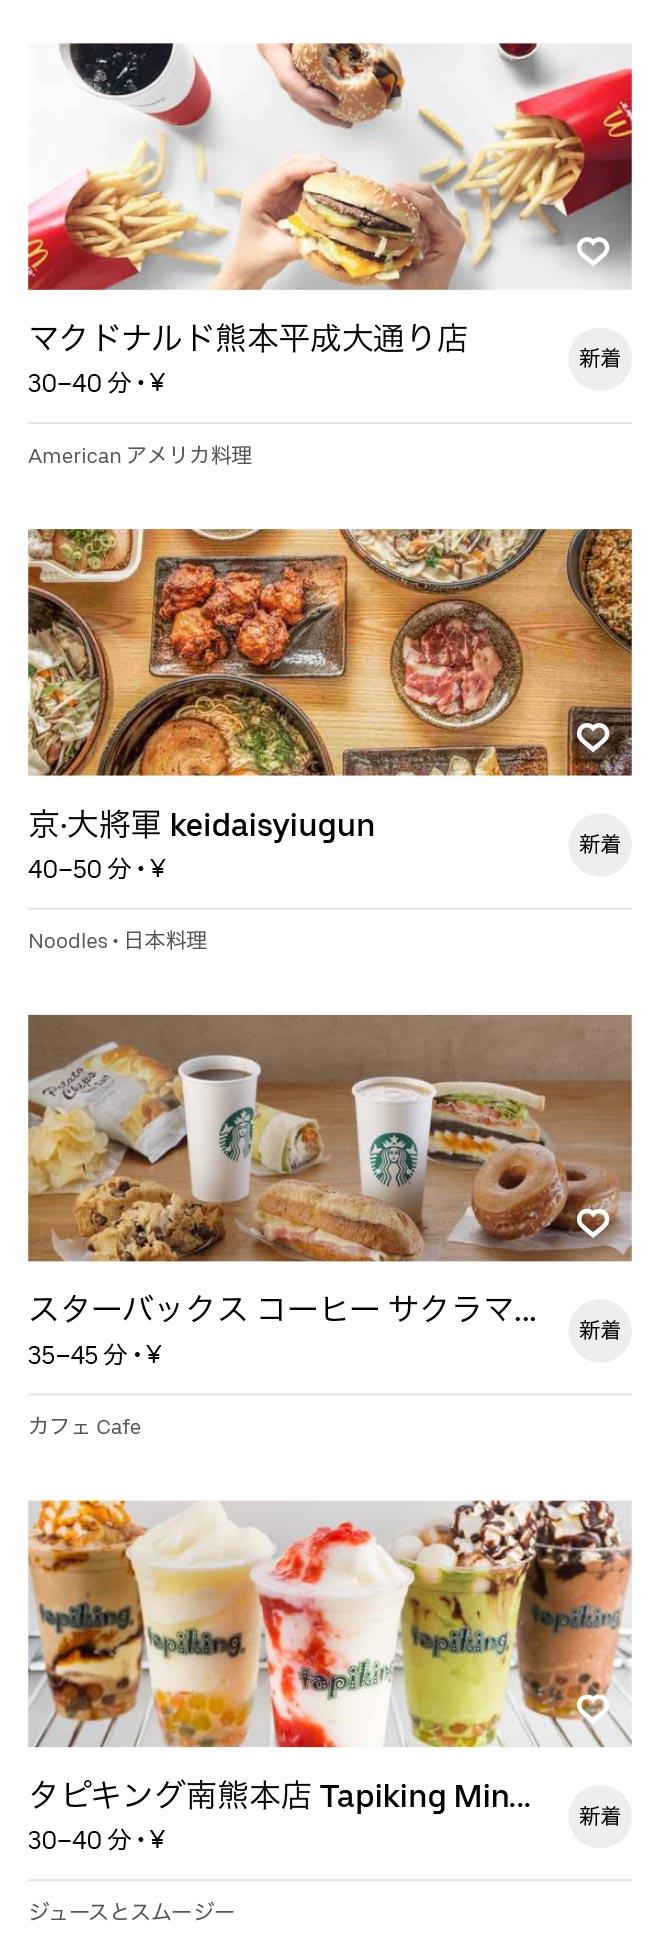 Kumamoto menu 2008 02